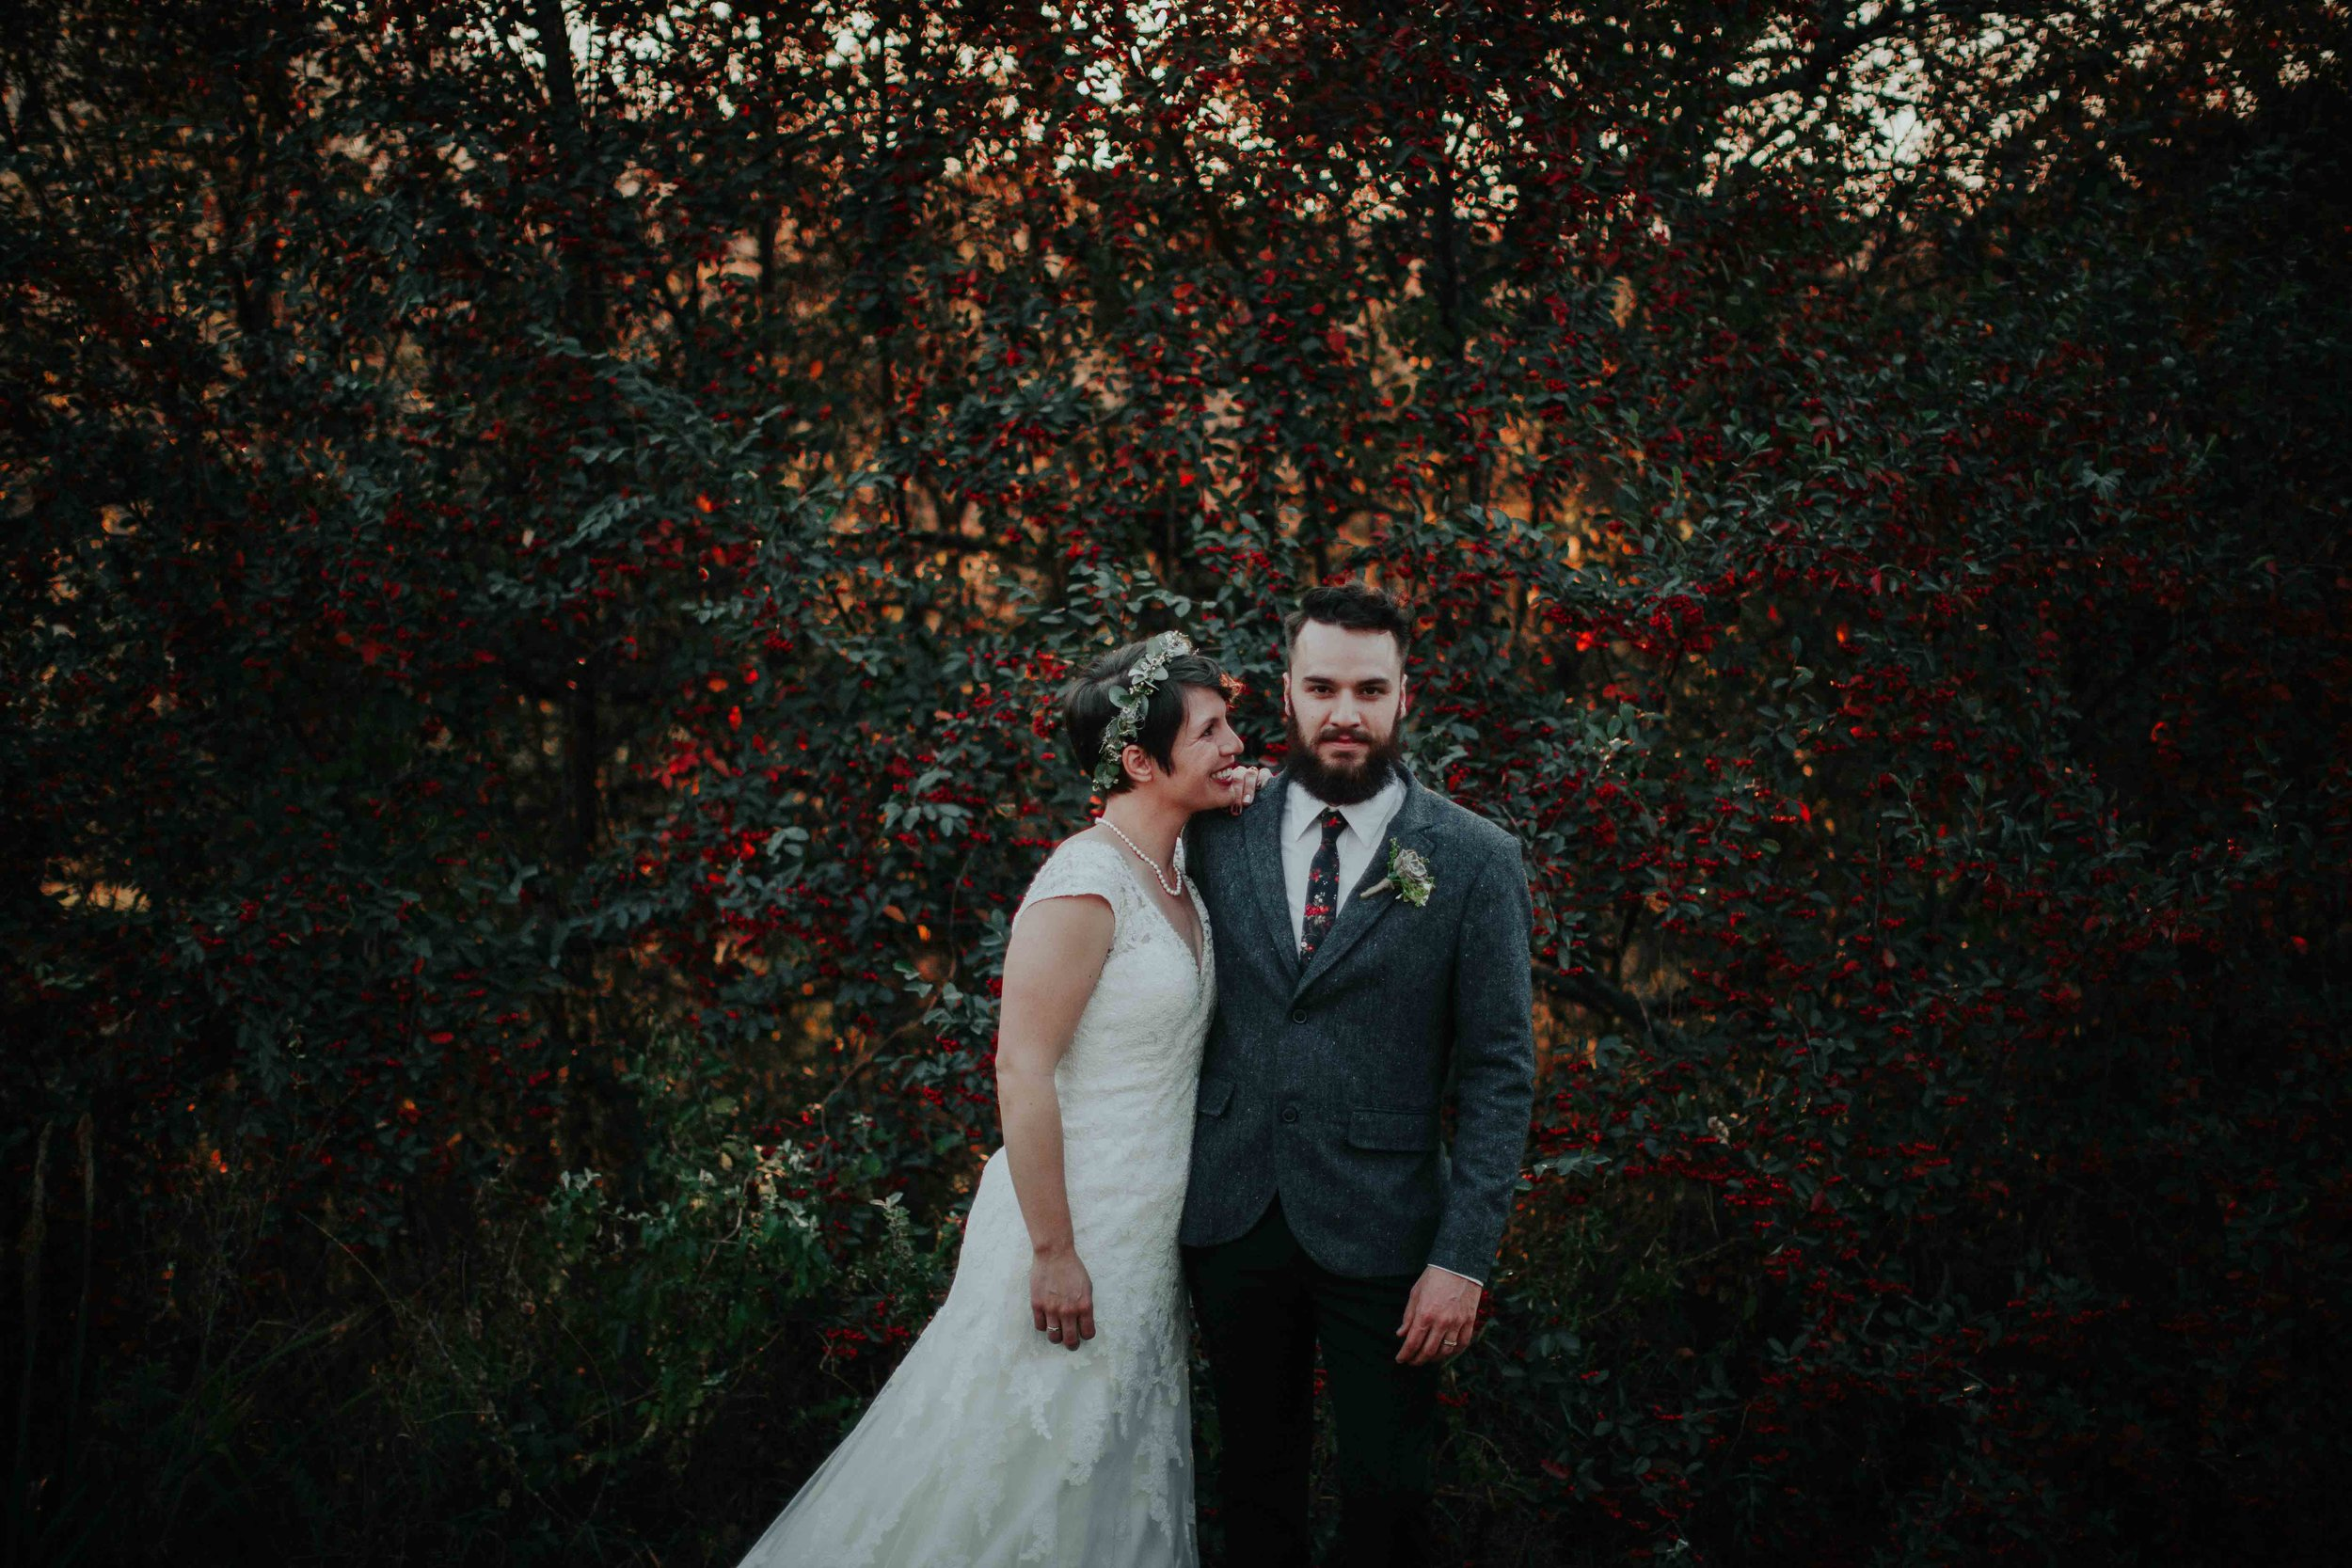 Kristi Smith Photography_Eloff&Jeanette_ Wedding Photographer 26.jpg